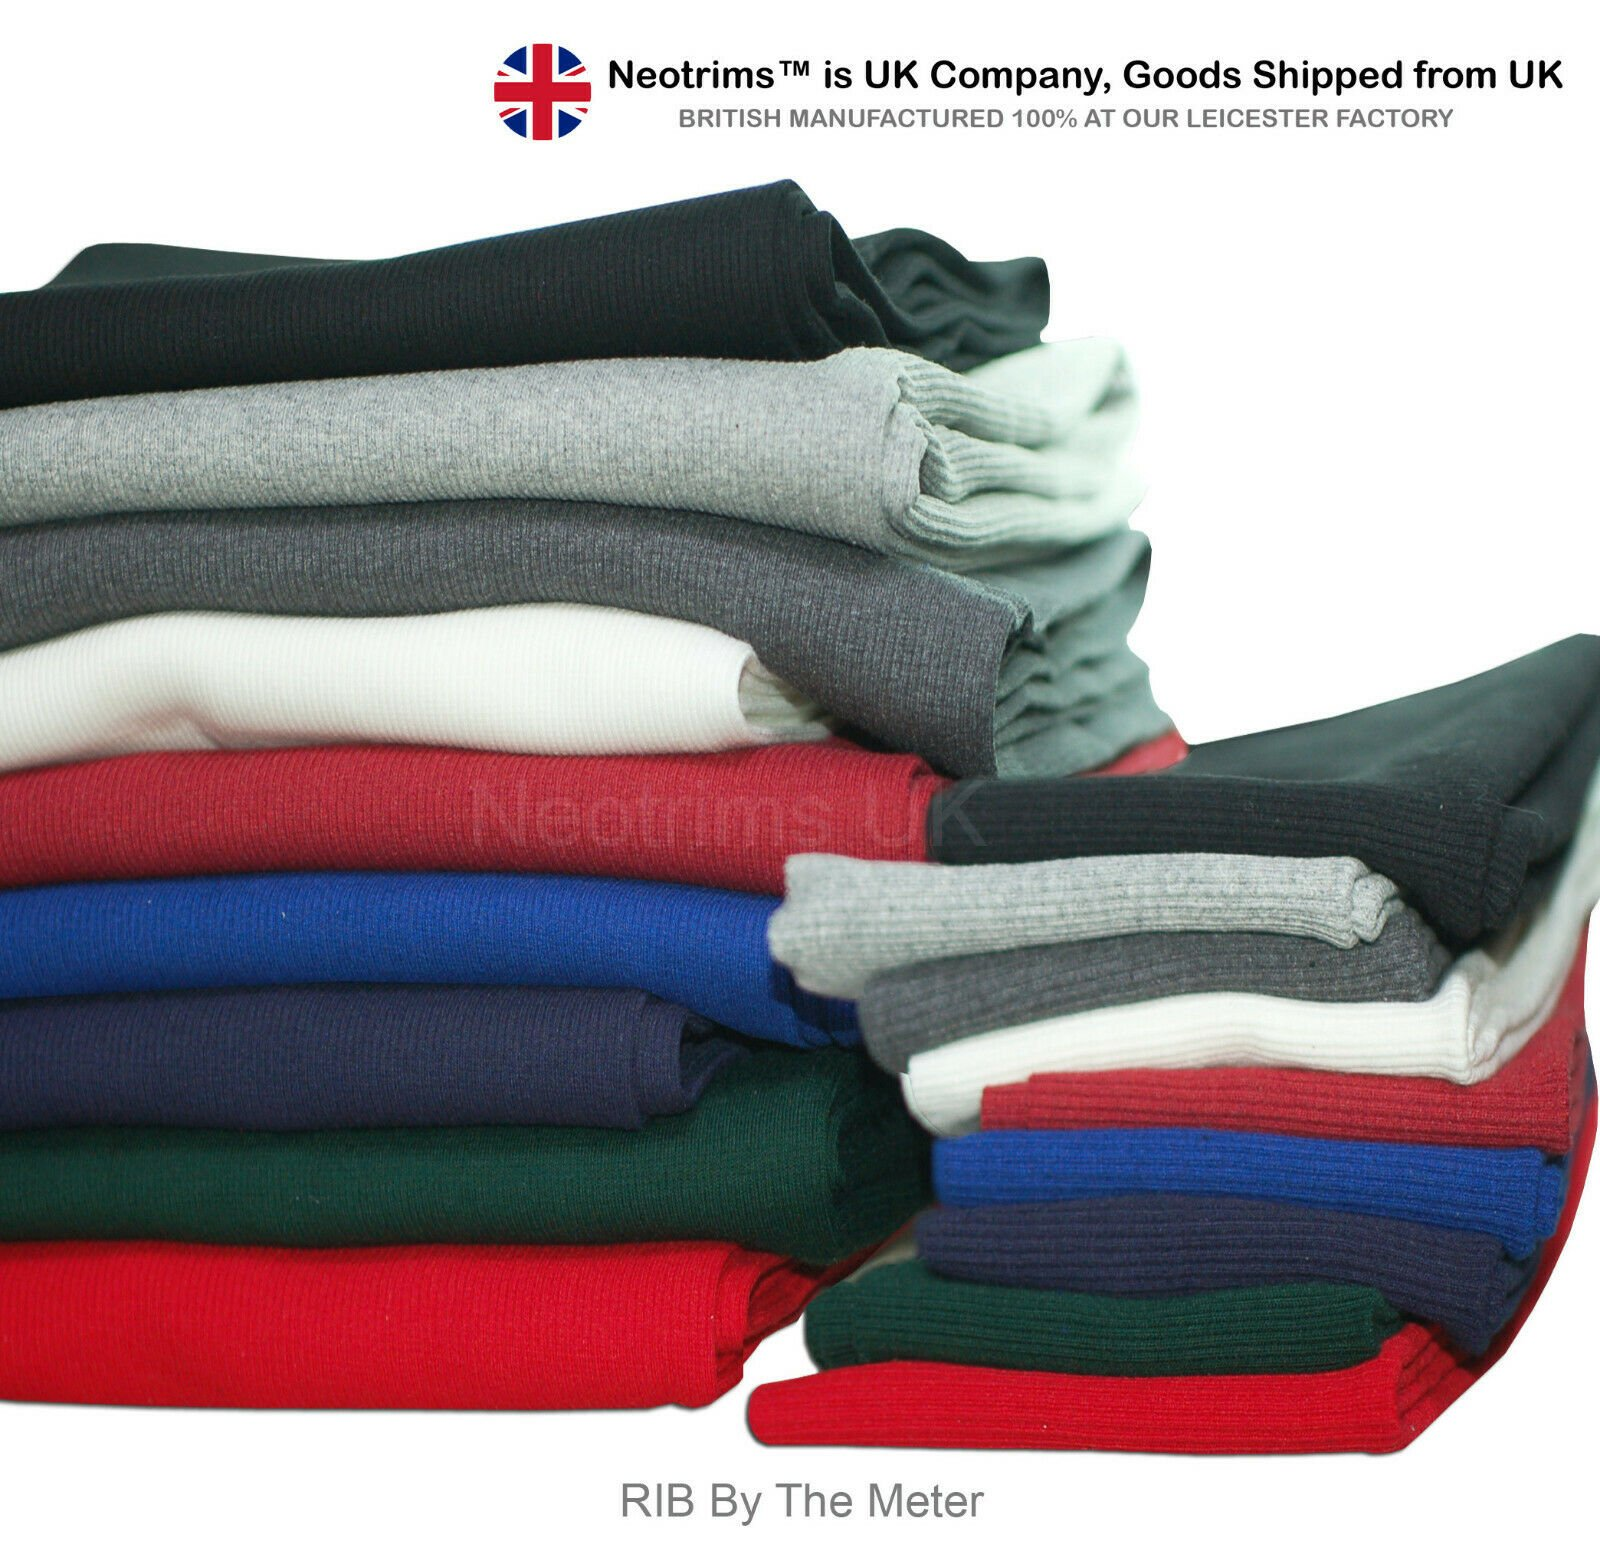 Knit Rib 2x2,Stretch Ribbing Matching Sweat Shirt Fleece Fabric Material,Neotrim